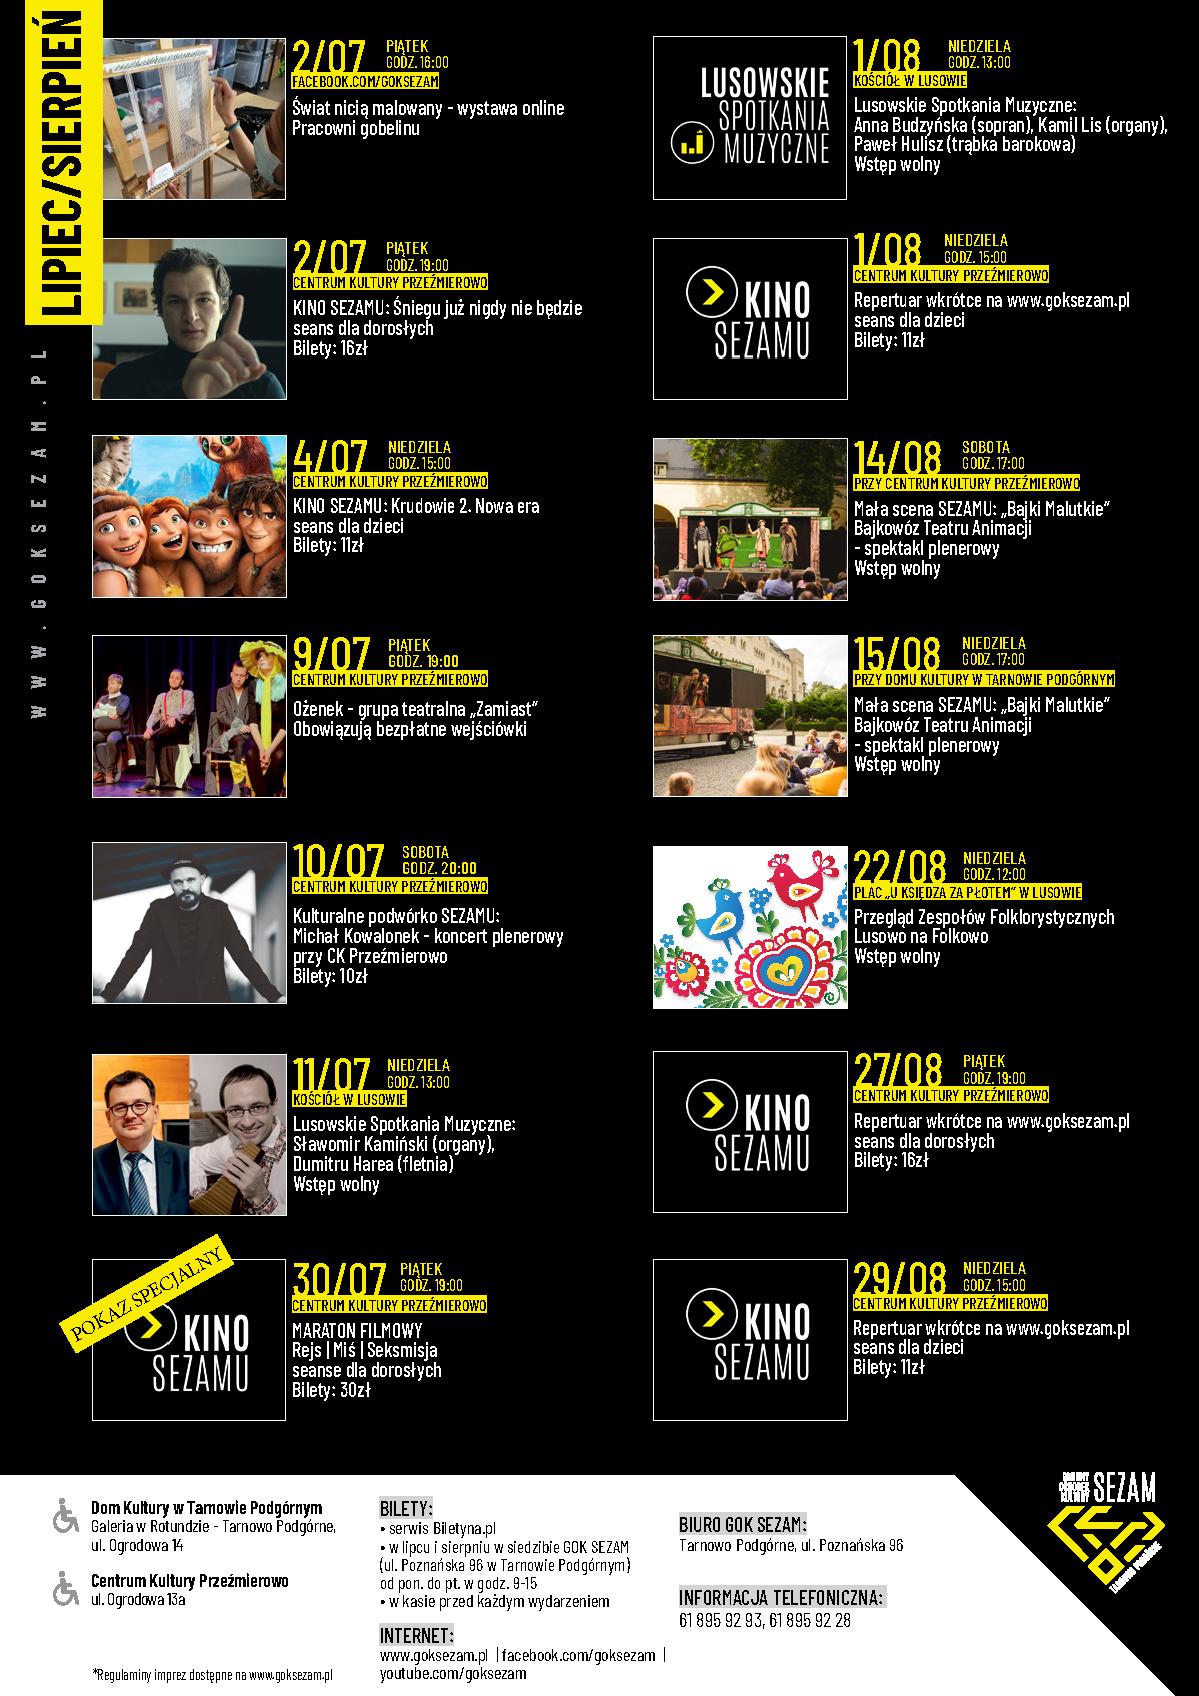 Kino Sezamu: KRUDOWIE 2: Nowa Era